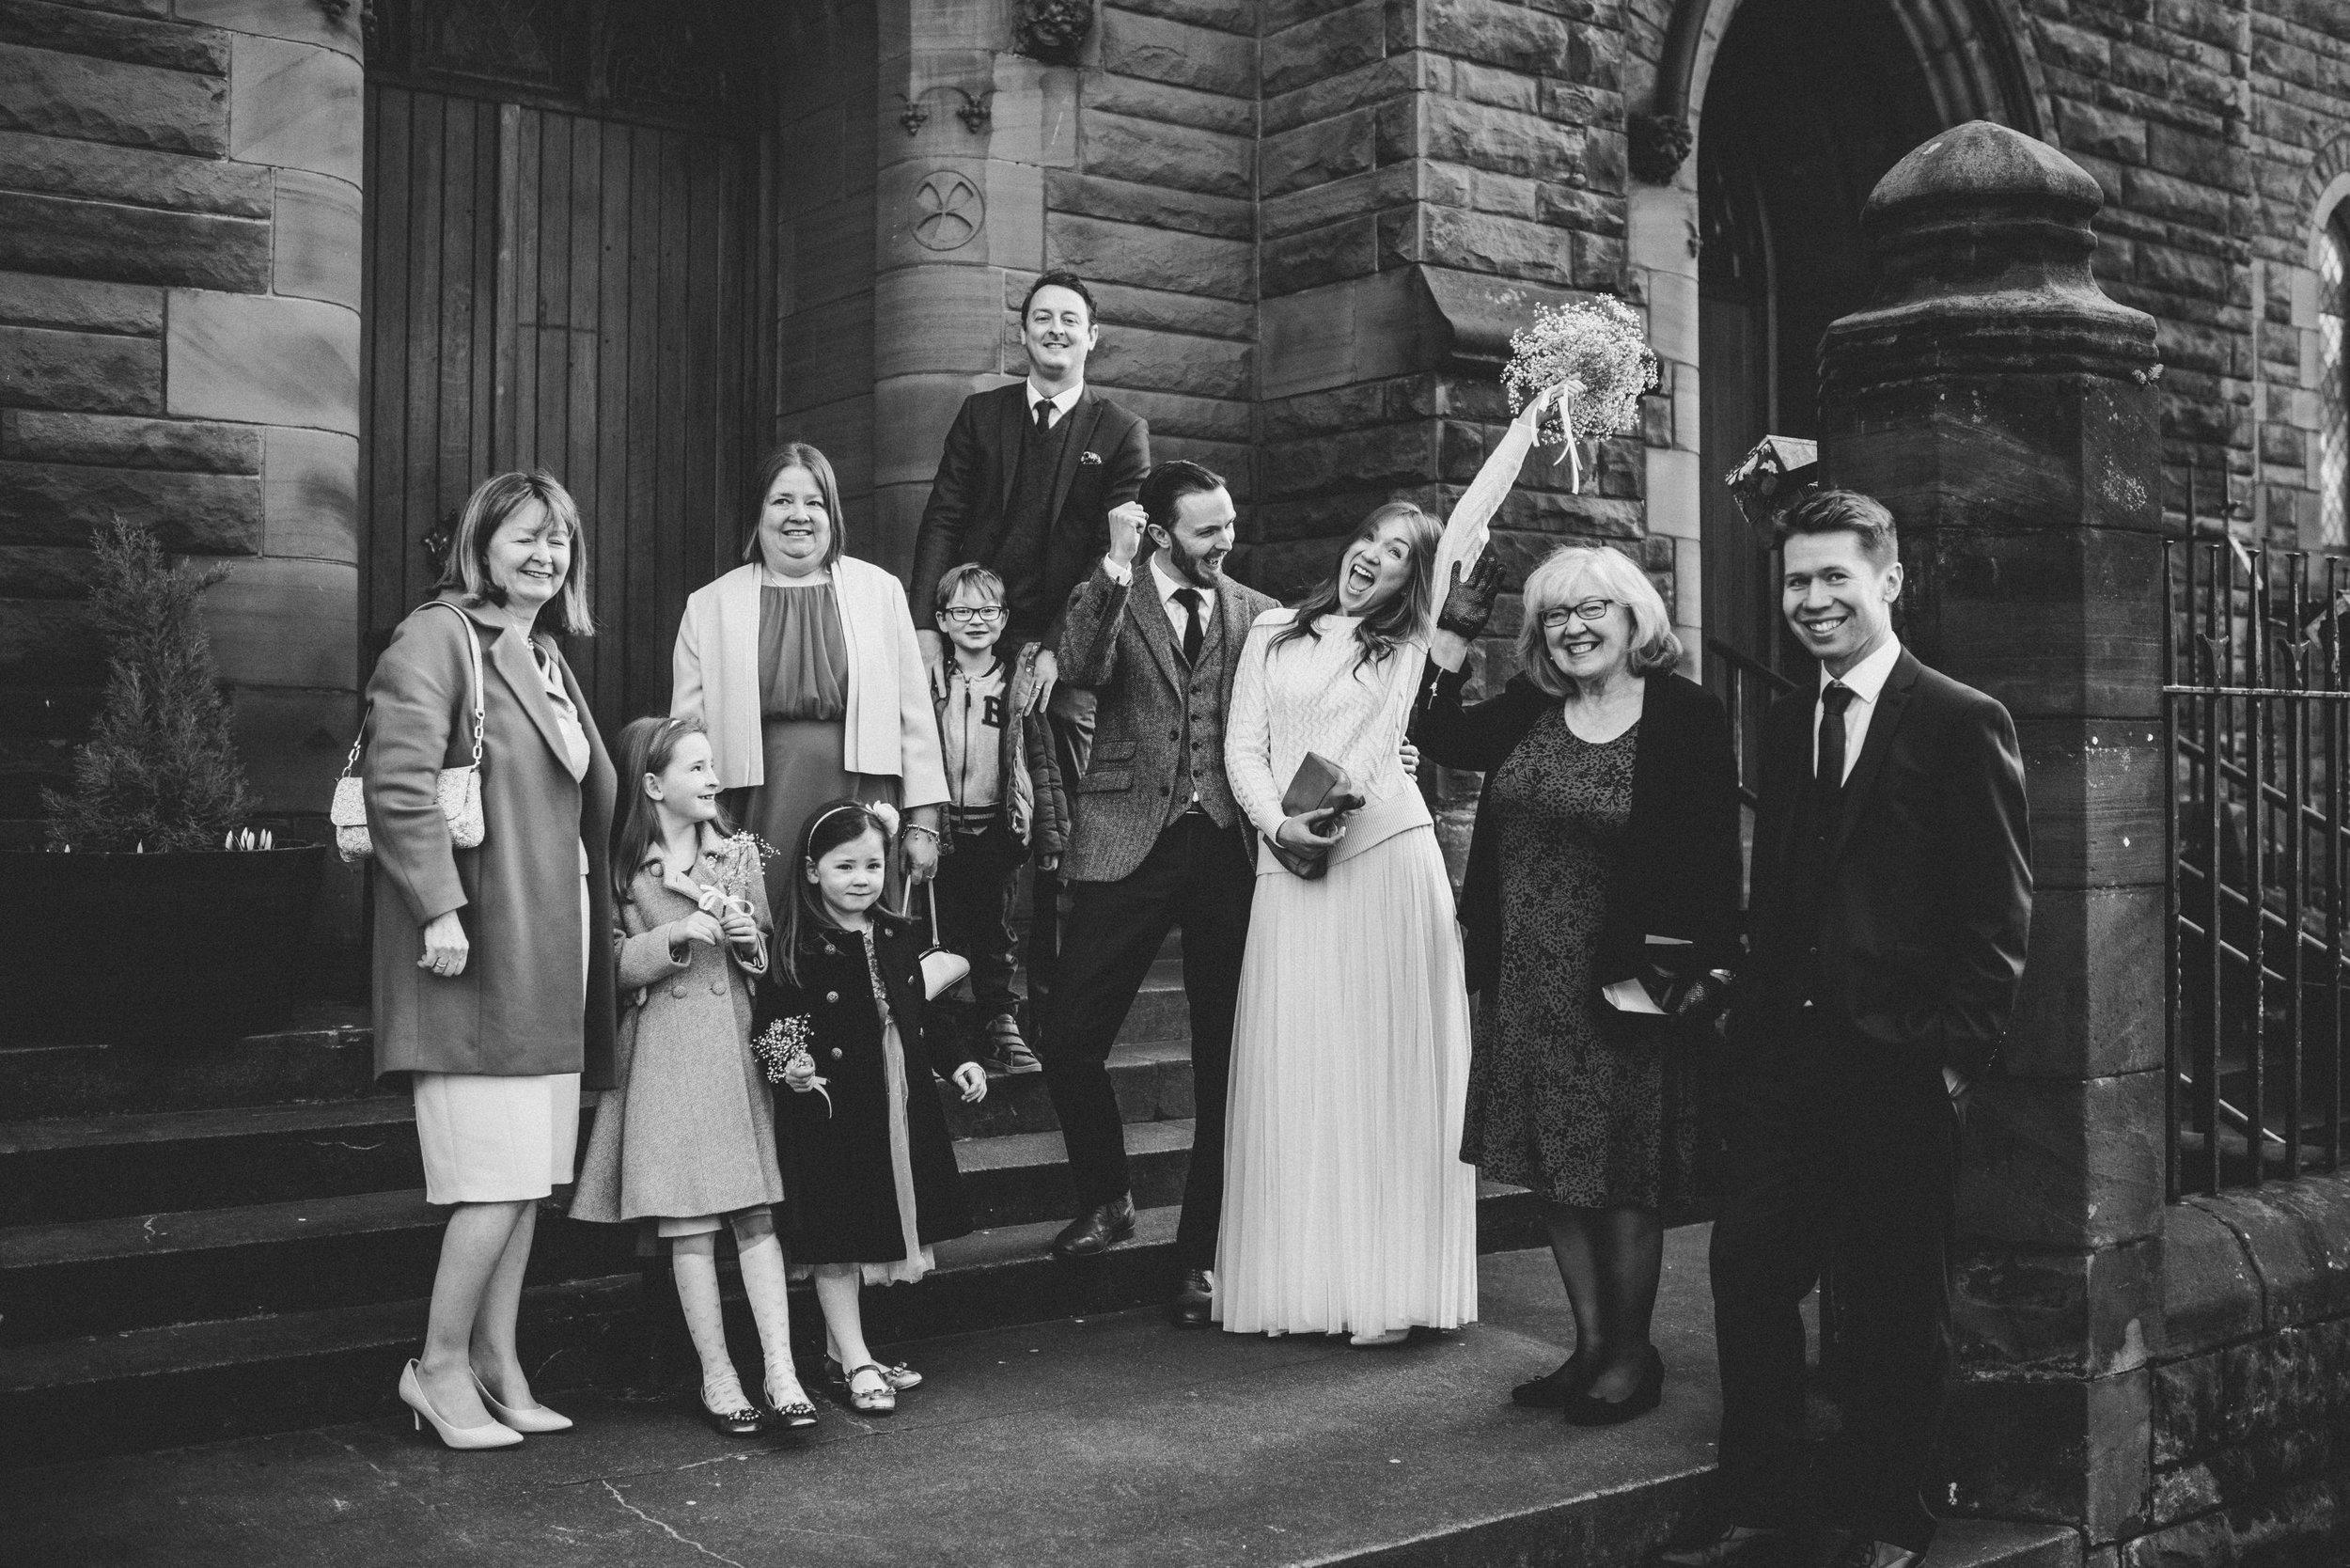 0156-LISA-DEVINE-PHOTOGRAPHY-ALTERNATIVE-WEDDING-PHOTOGRAPHY-SCOTLAND-DESTINATION-WEDDINGS-GLASGOW-WEDDINGS-COOL-WEDDINGS-STYLISH-WEDDINGS.JPG